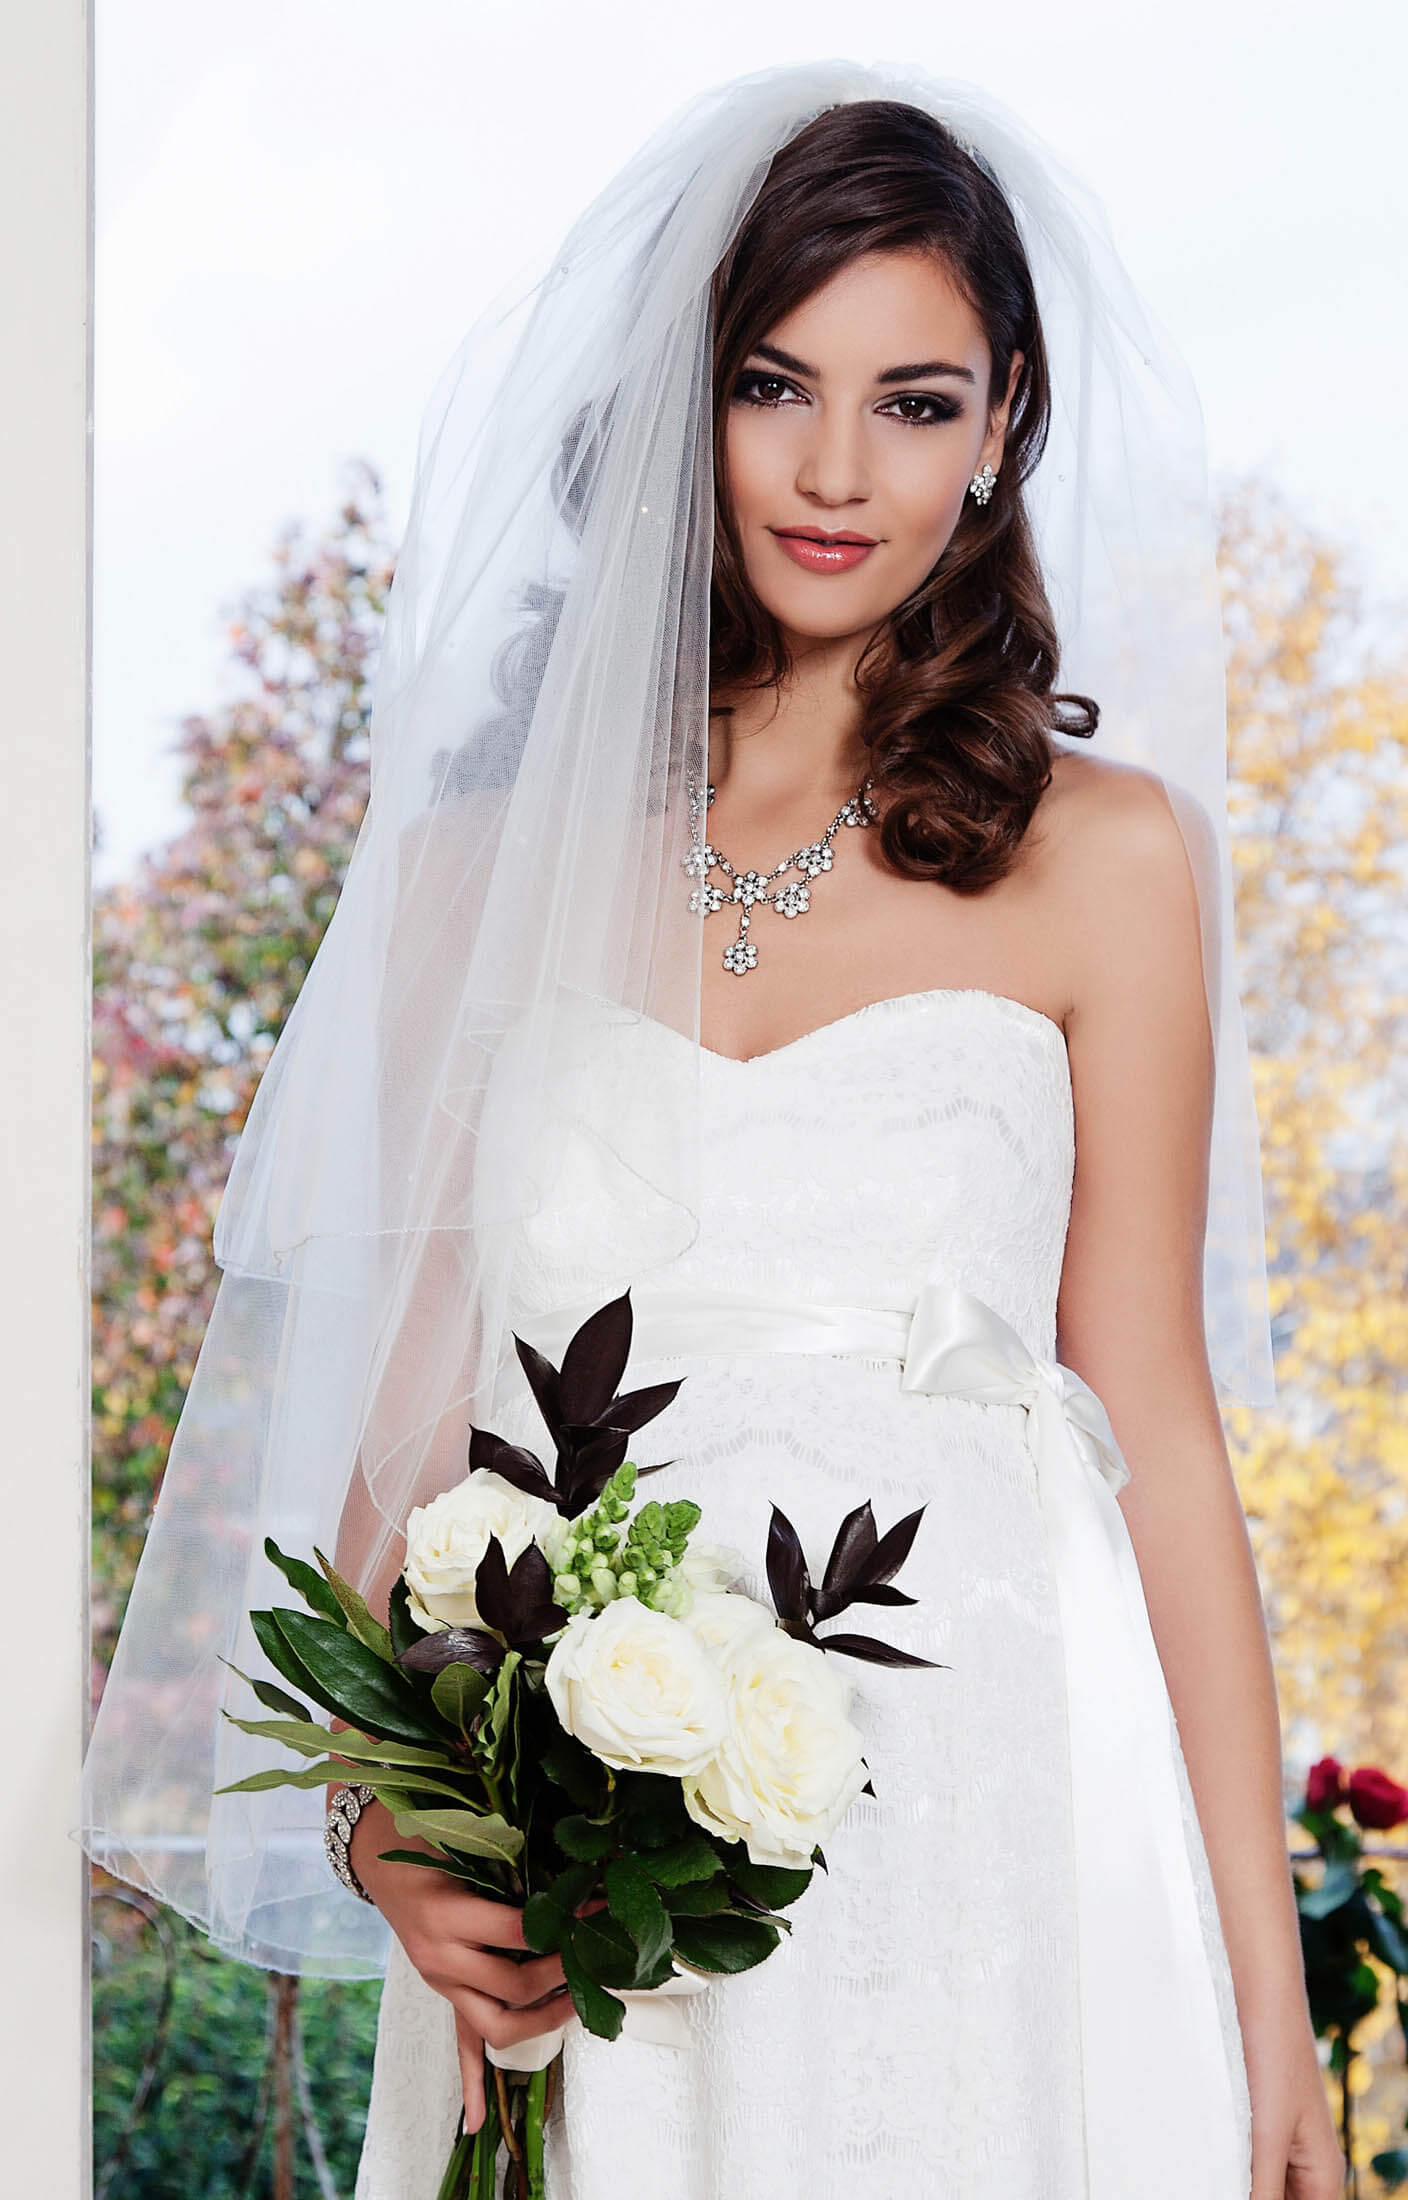 Charlotte Bridal Veil - Maternity Wedding Dresses, Evening Wear and ...